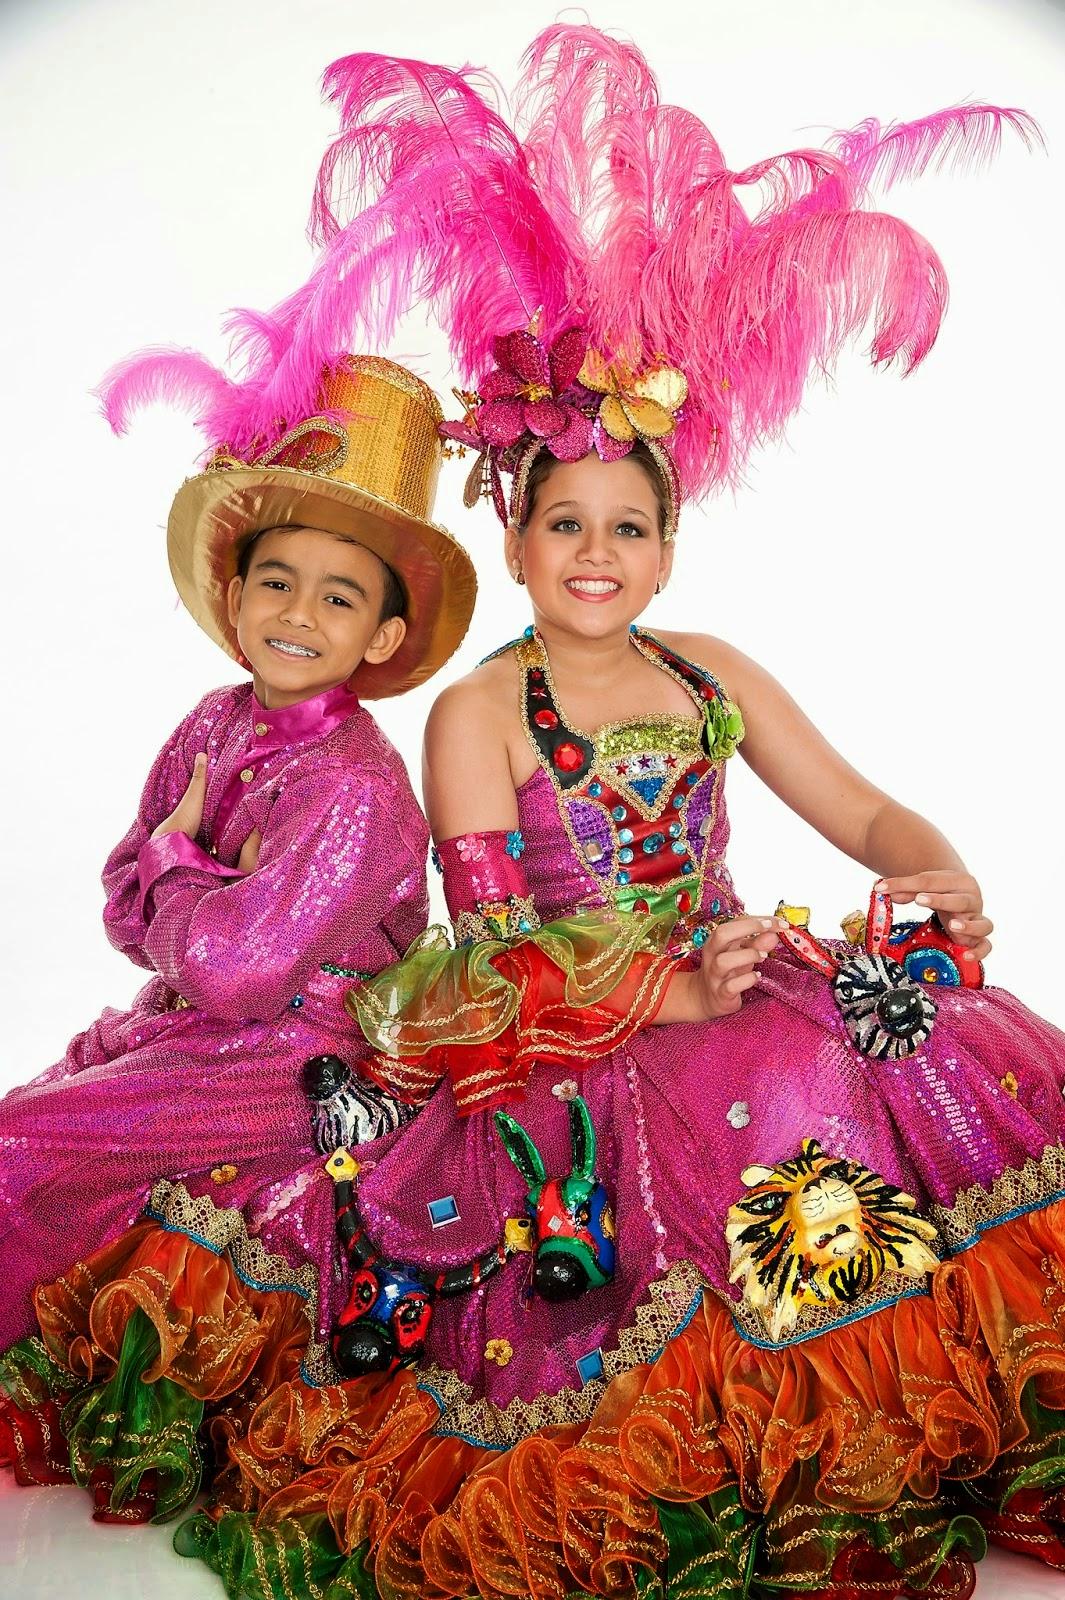 Reyes Infantiles del Carnaval de Barranquilla 2015